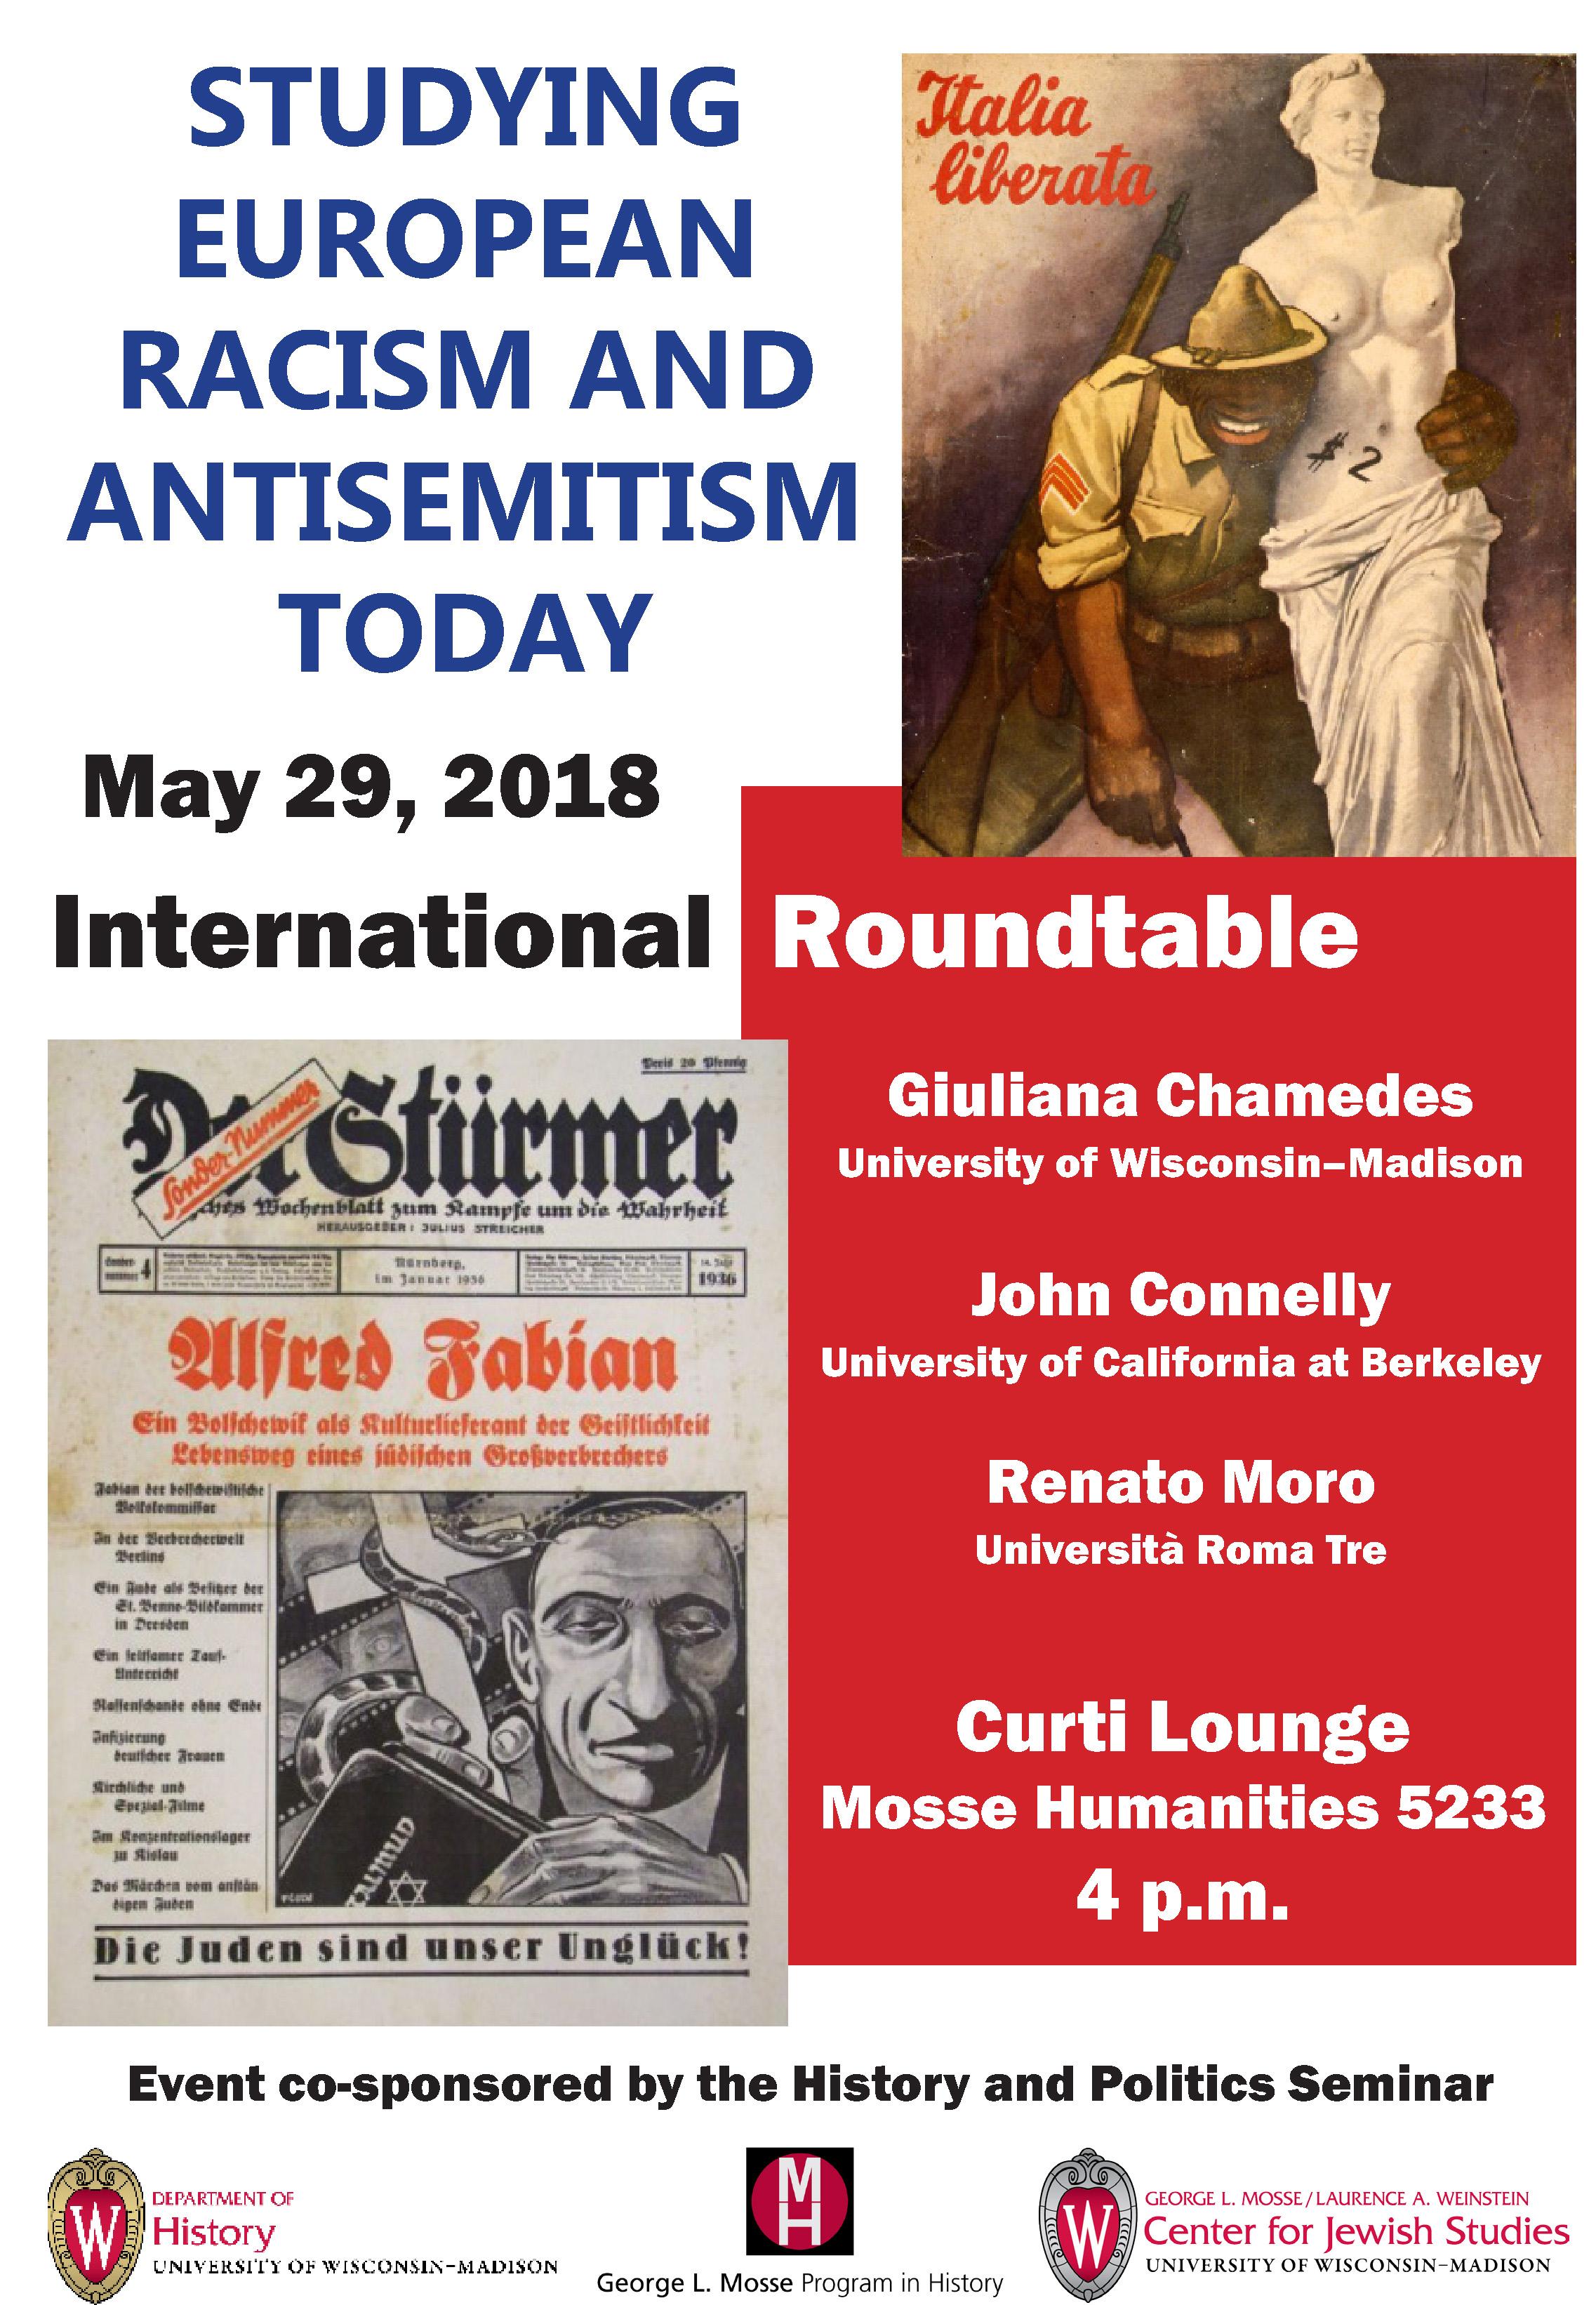 2018.05.29 roundtable-antisemitism-racism